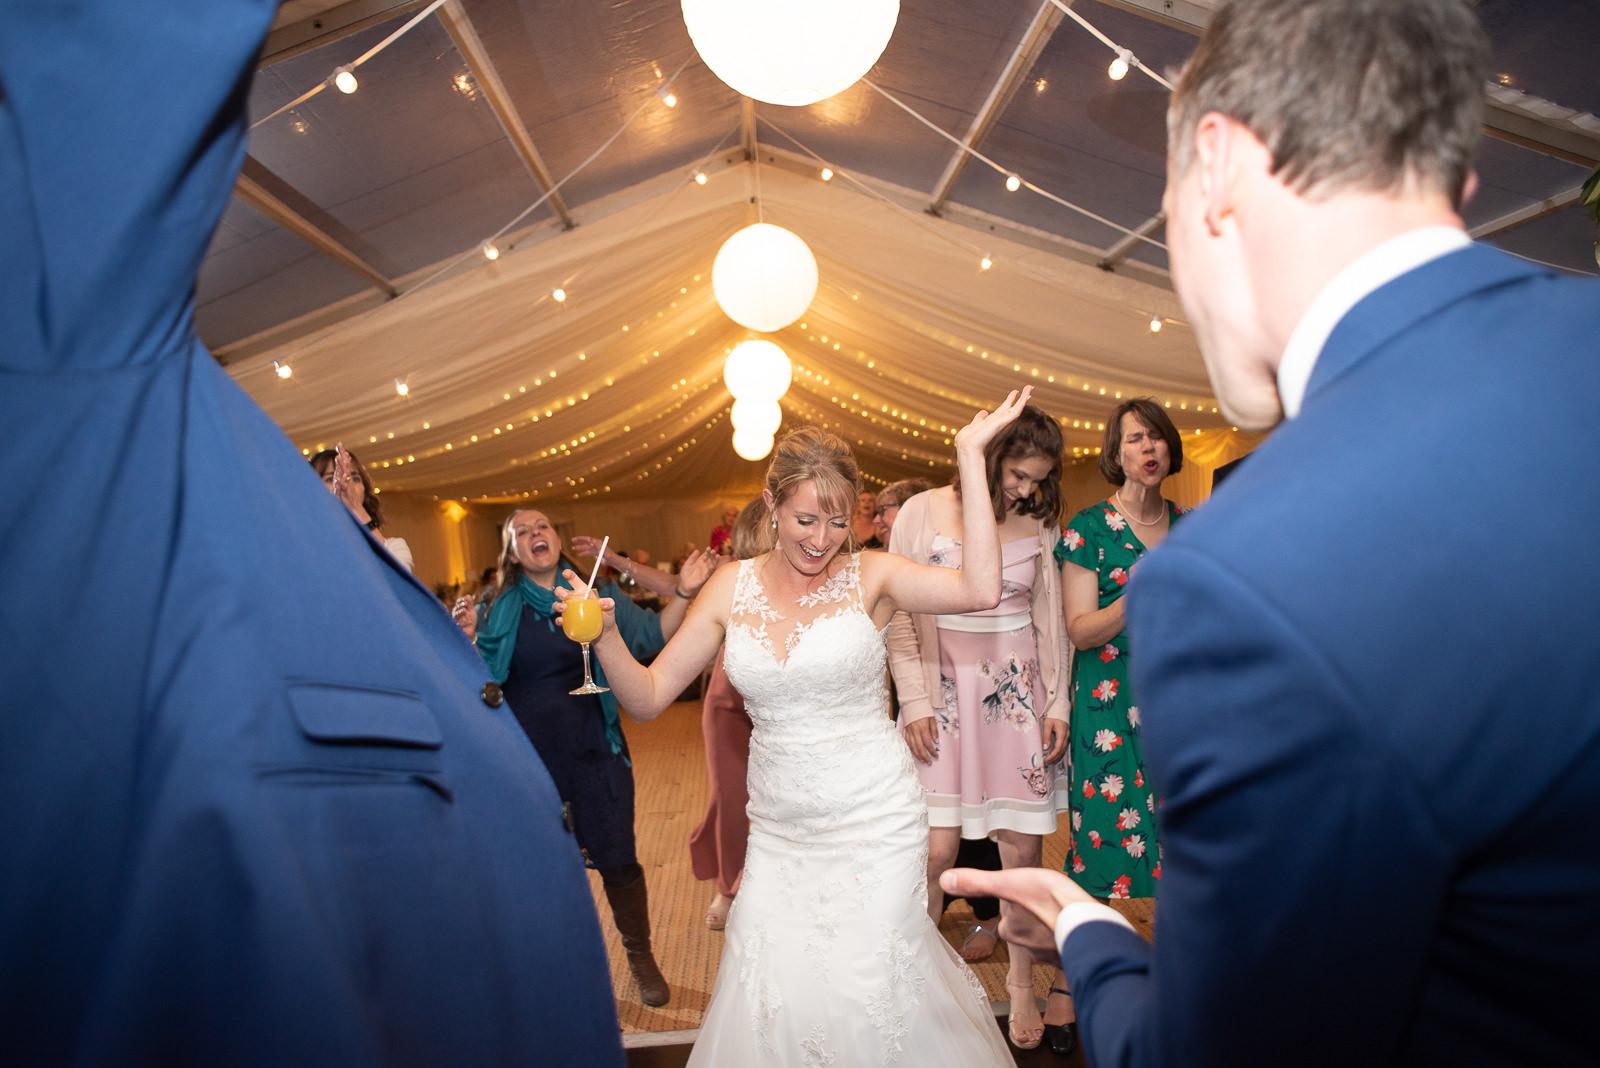 Roscarrock Farm wedding in Cornwall 085.jpg